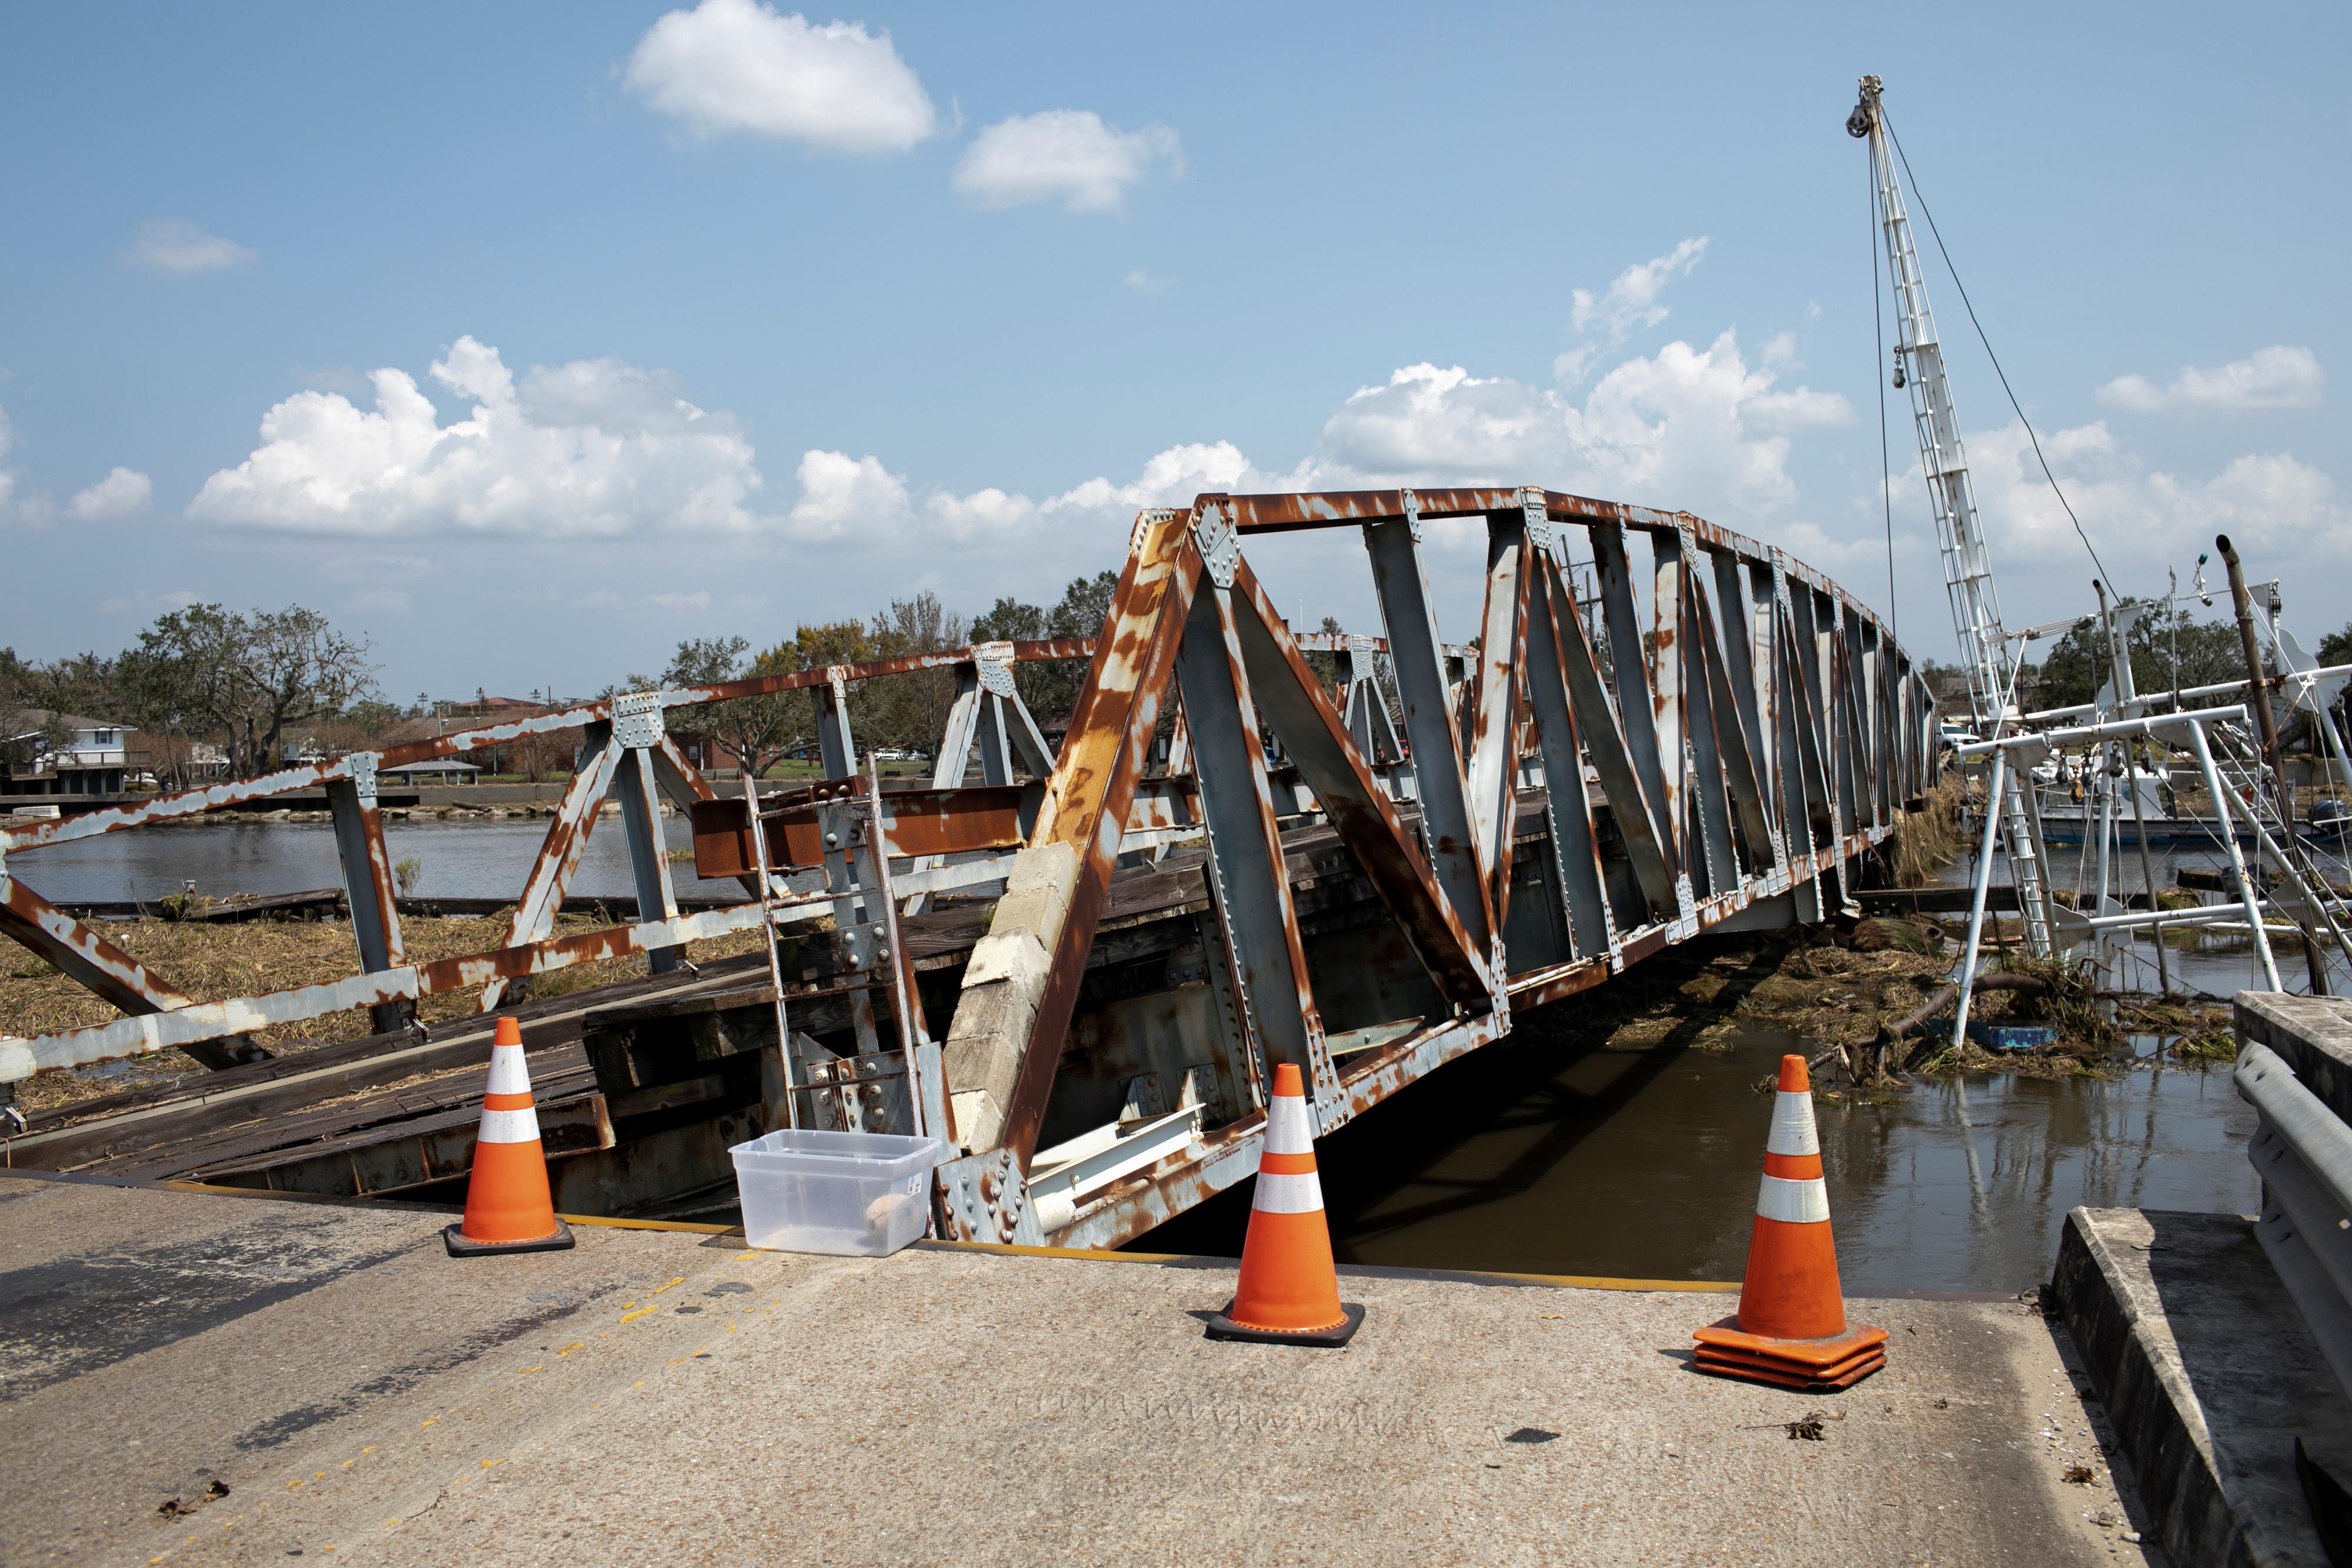 A damaged bridge is seen in the aftermath of Hurricane Ida landfall in Louisiana, in Jean Lafitte, Louisiana, U.S. September 2, 2021. REUTERS/Marco Bello